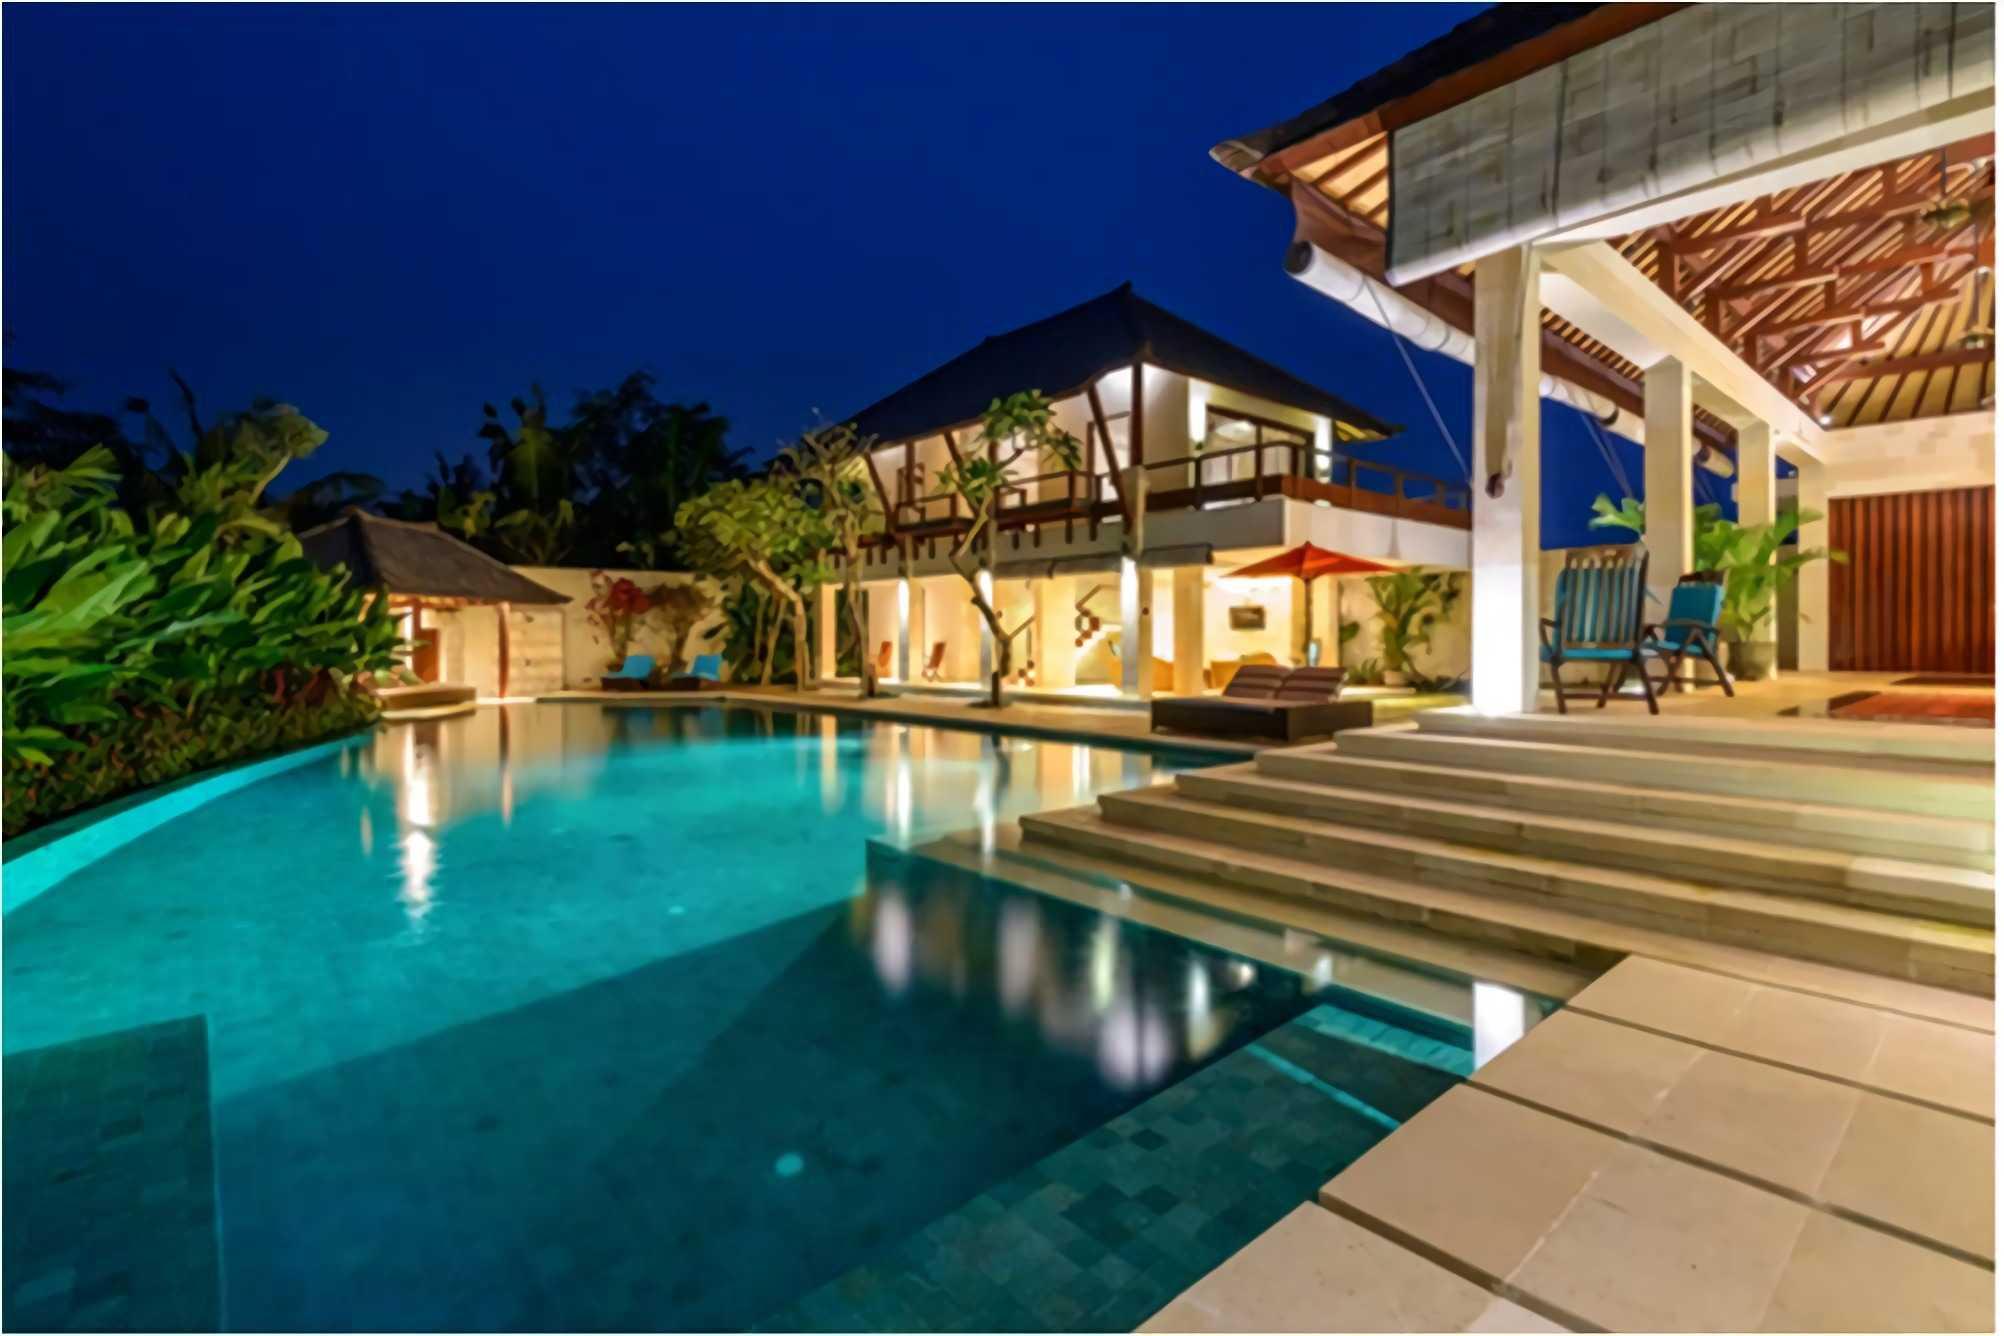 Hg Architects & Designers Associates Villa Saya Canggu, Bali Canggu, Bali Swimming Pool Area   24260